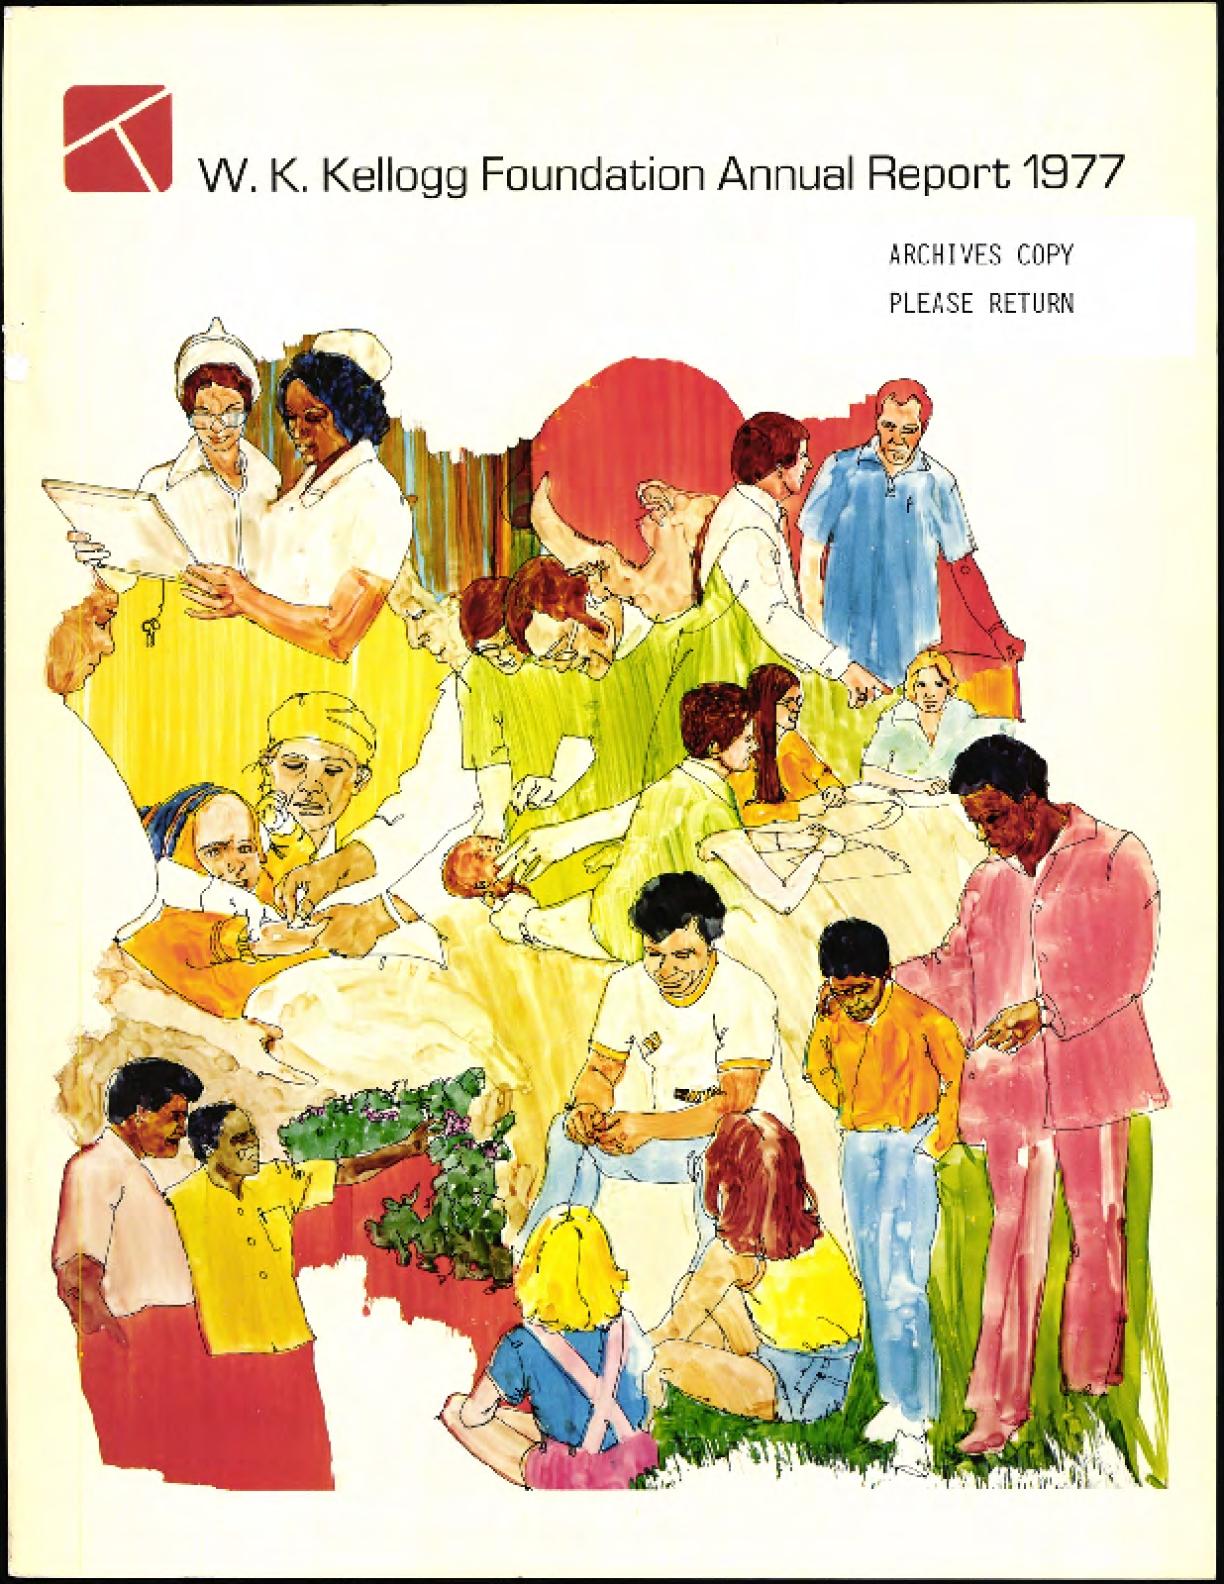 1977 W.K. Kellogg Foundation Annual Report